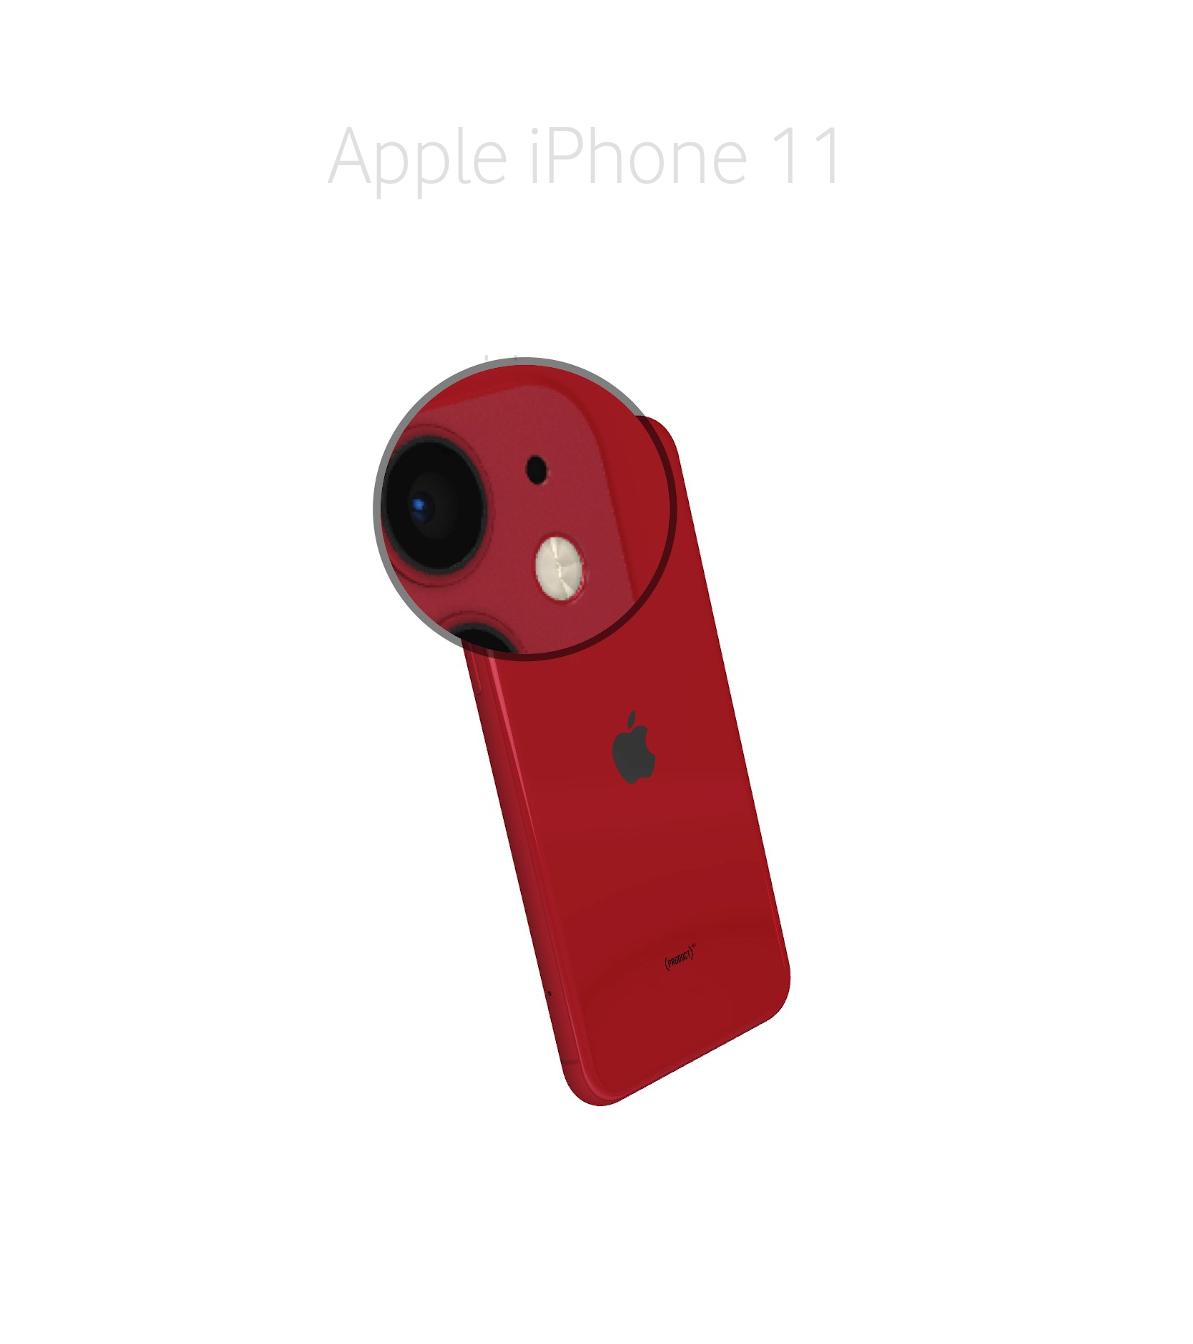 Laga mikrofon kamera iPhone 11